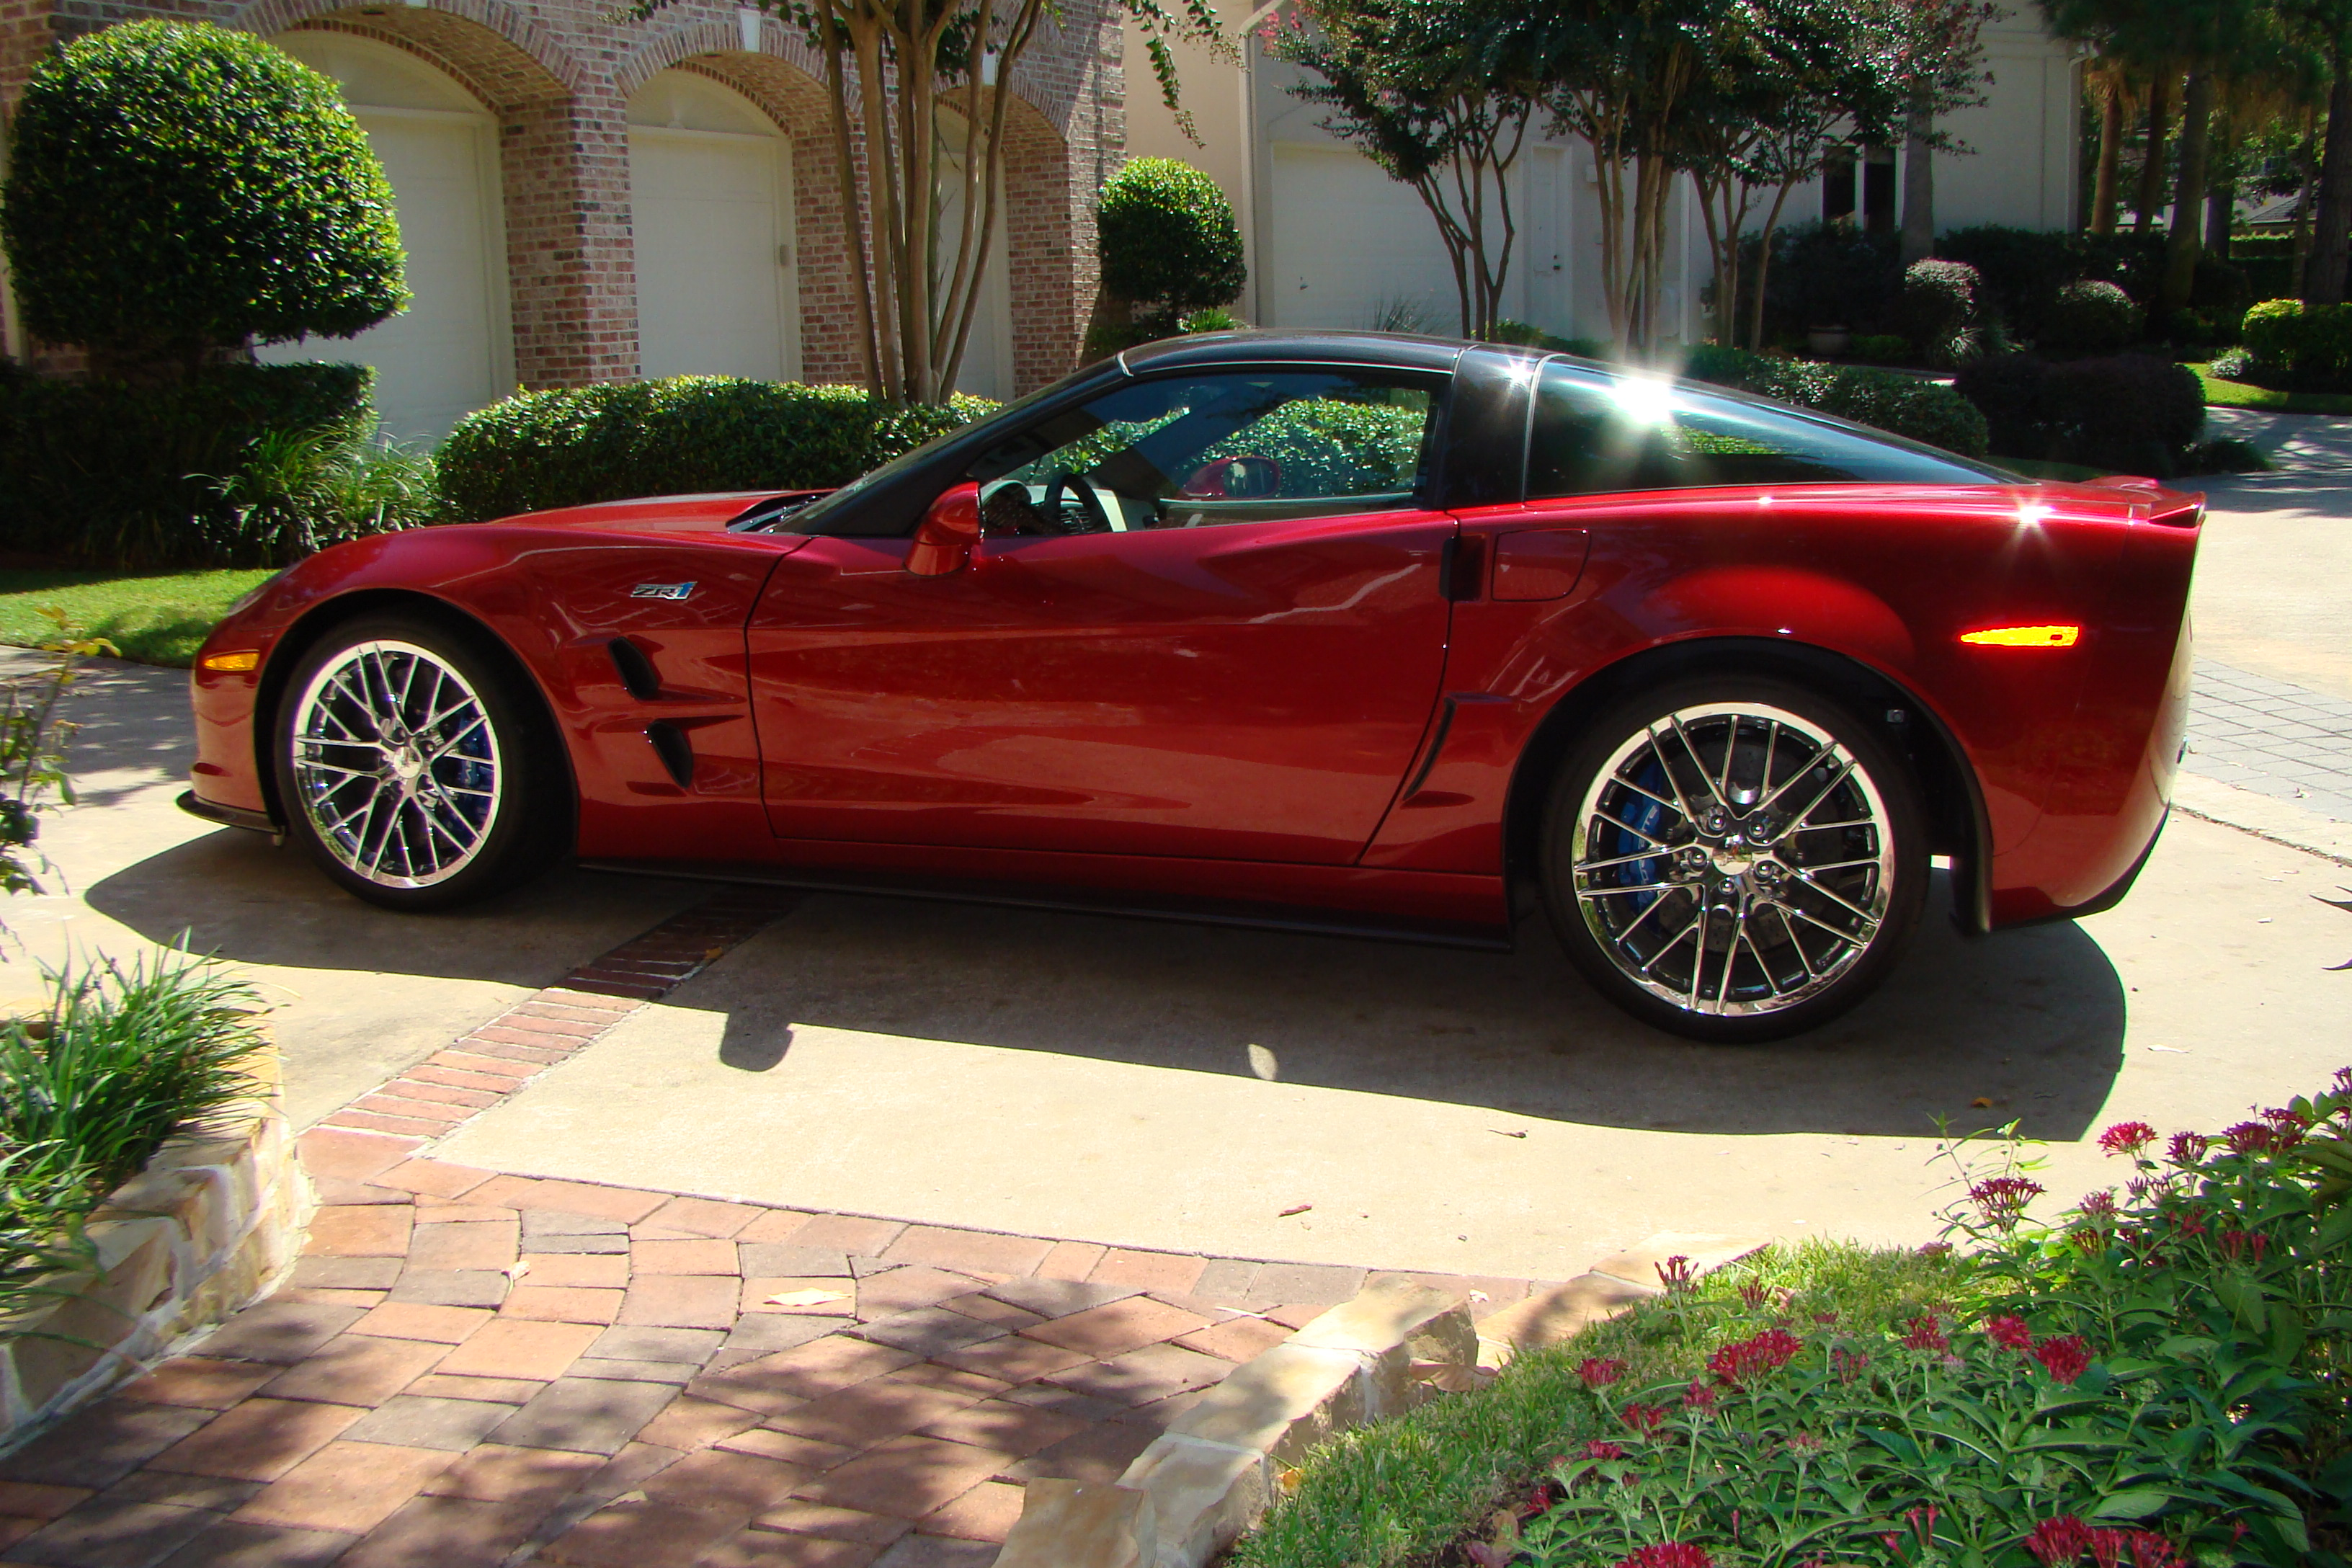 Attrayant 2011 Corvette Crystal Red ZR1   Frank S.   Houston, TX